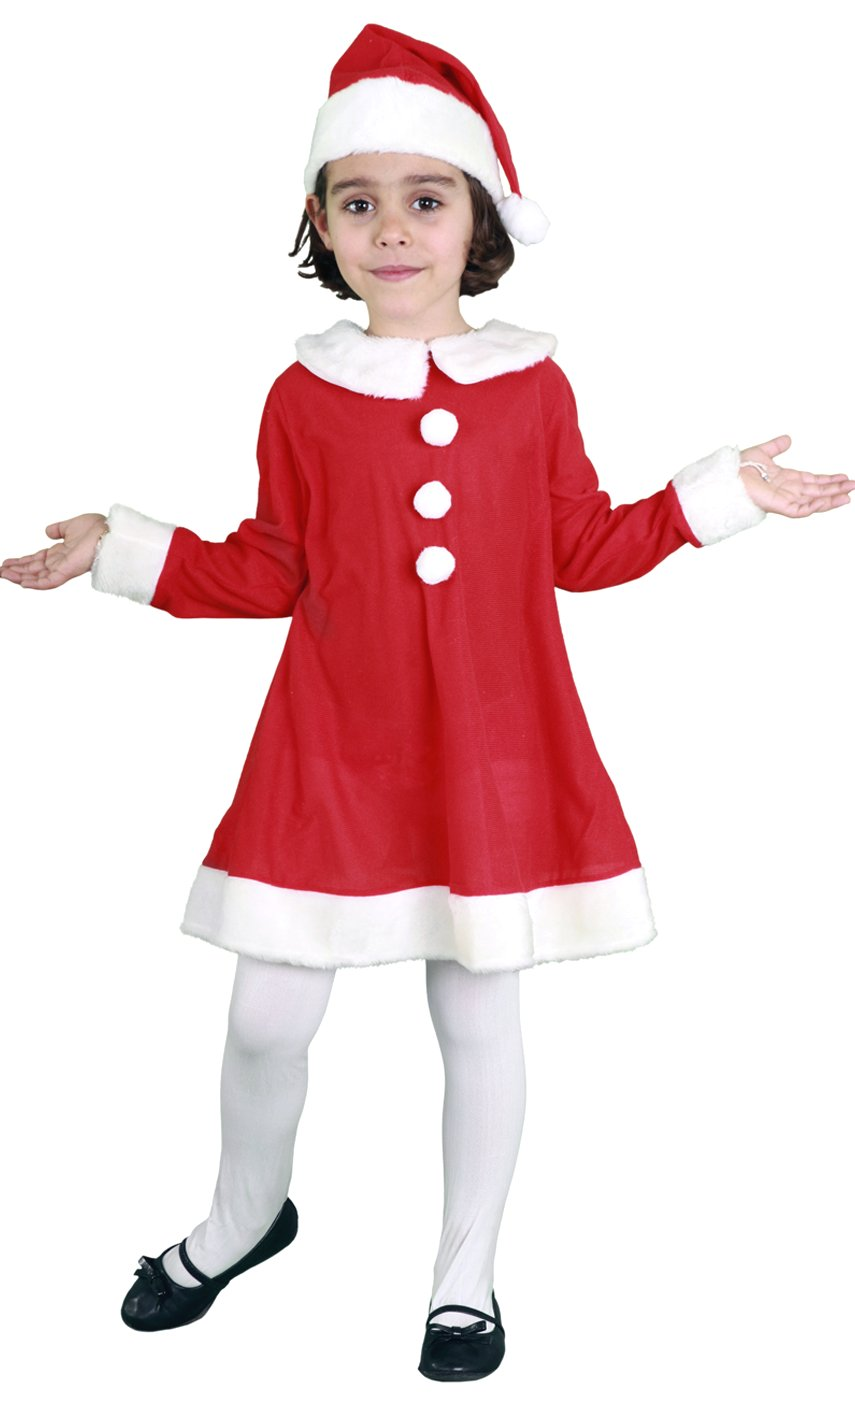 Costume-Mère-Noël-Fille